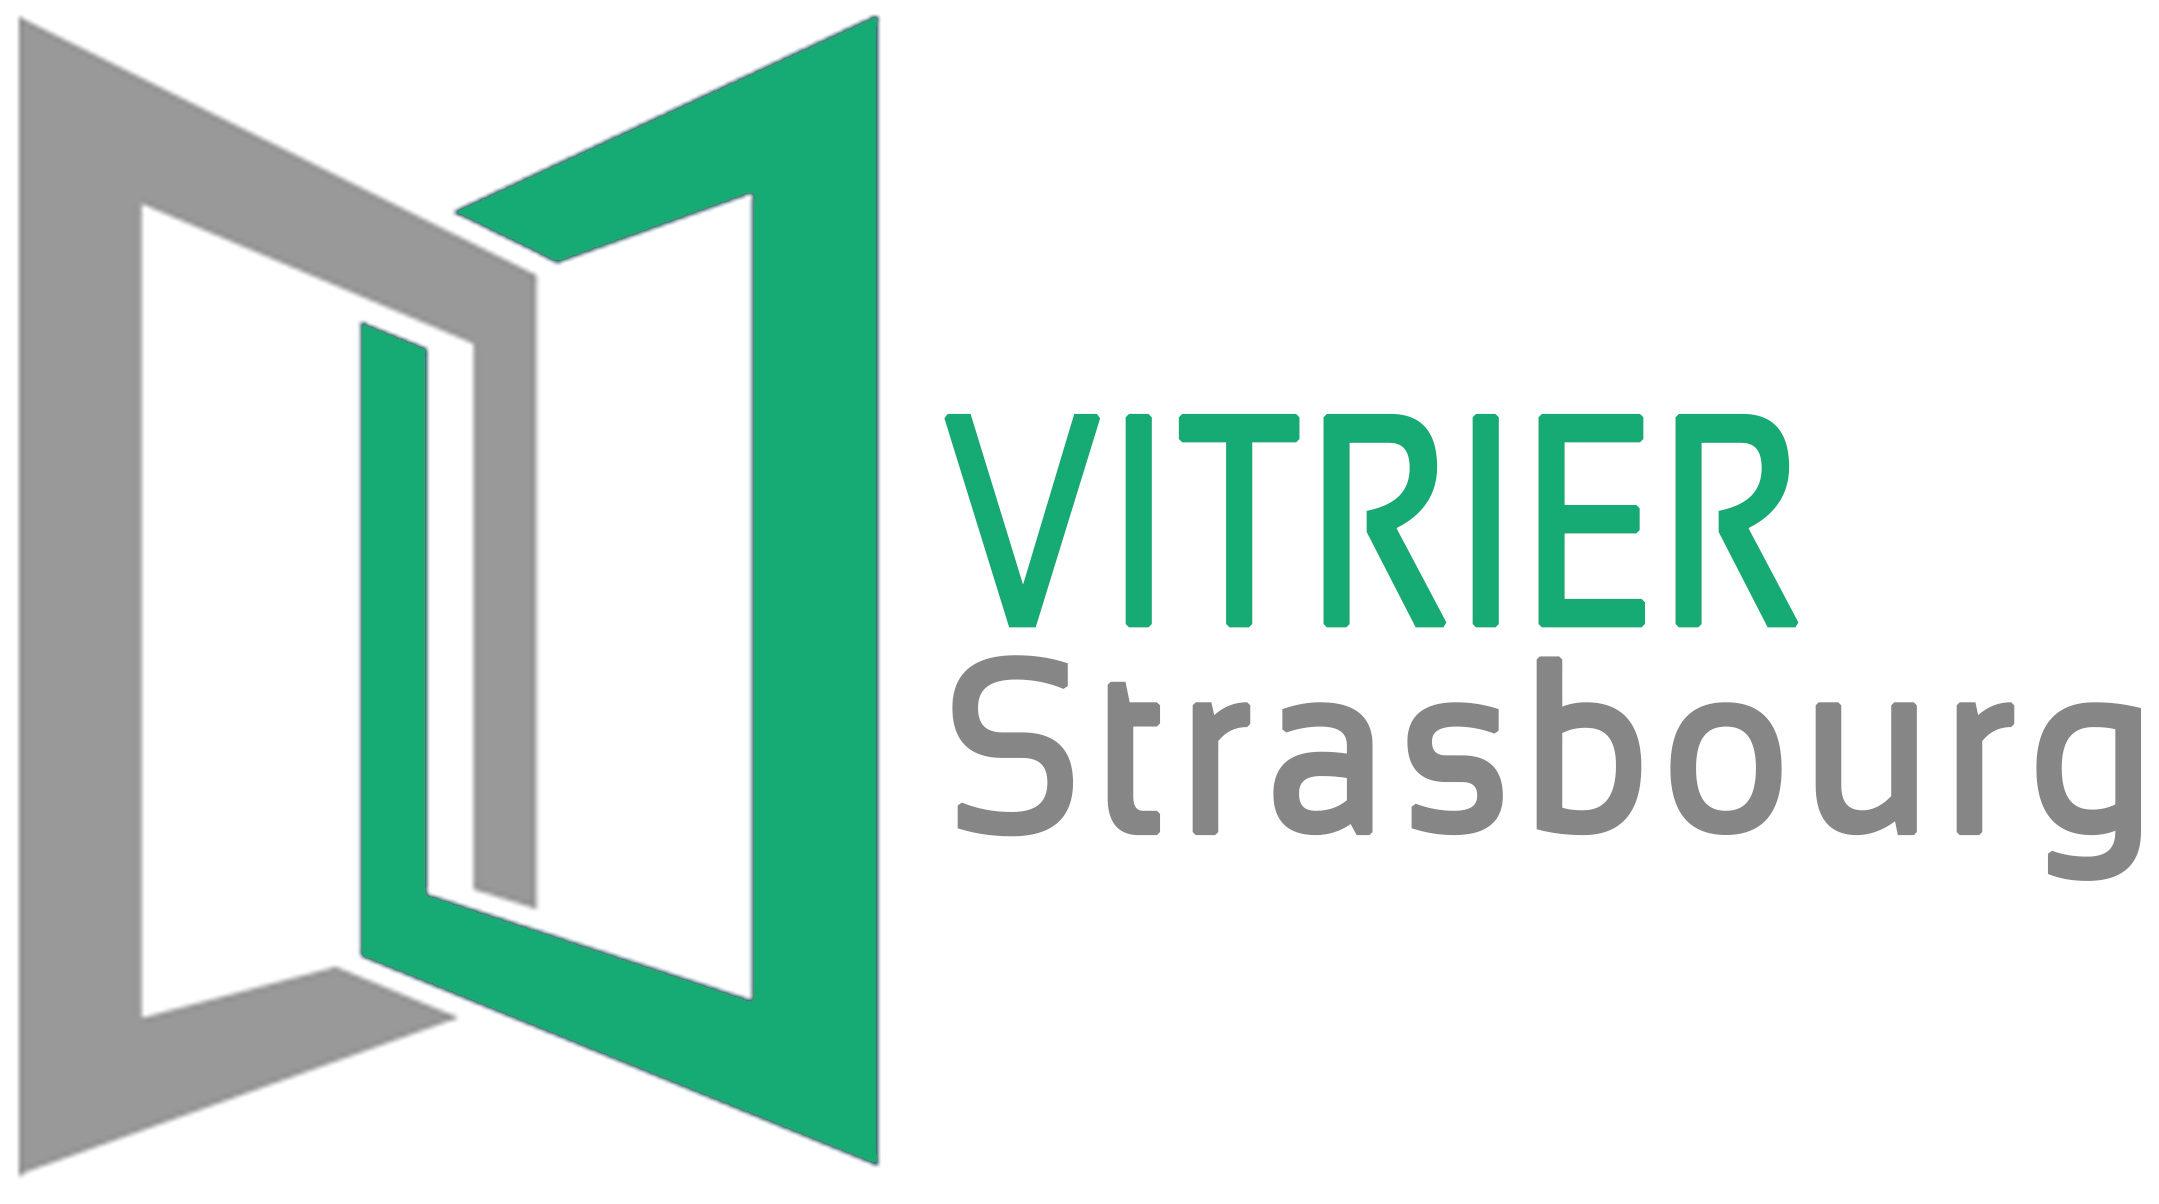 Vitrier Strasbourg